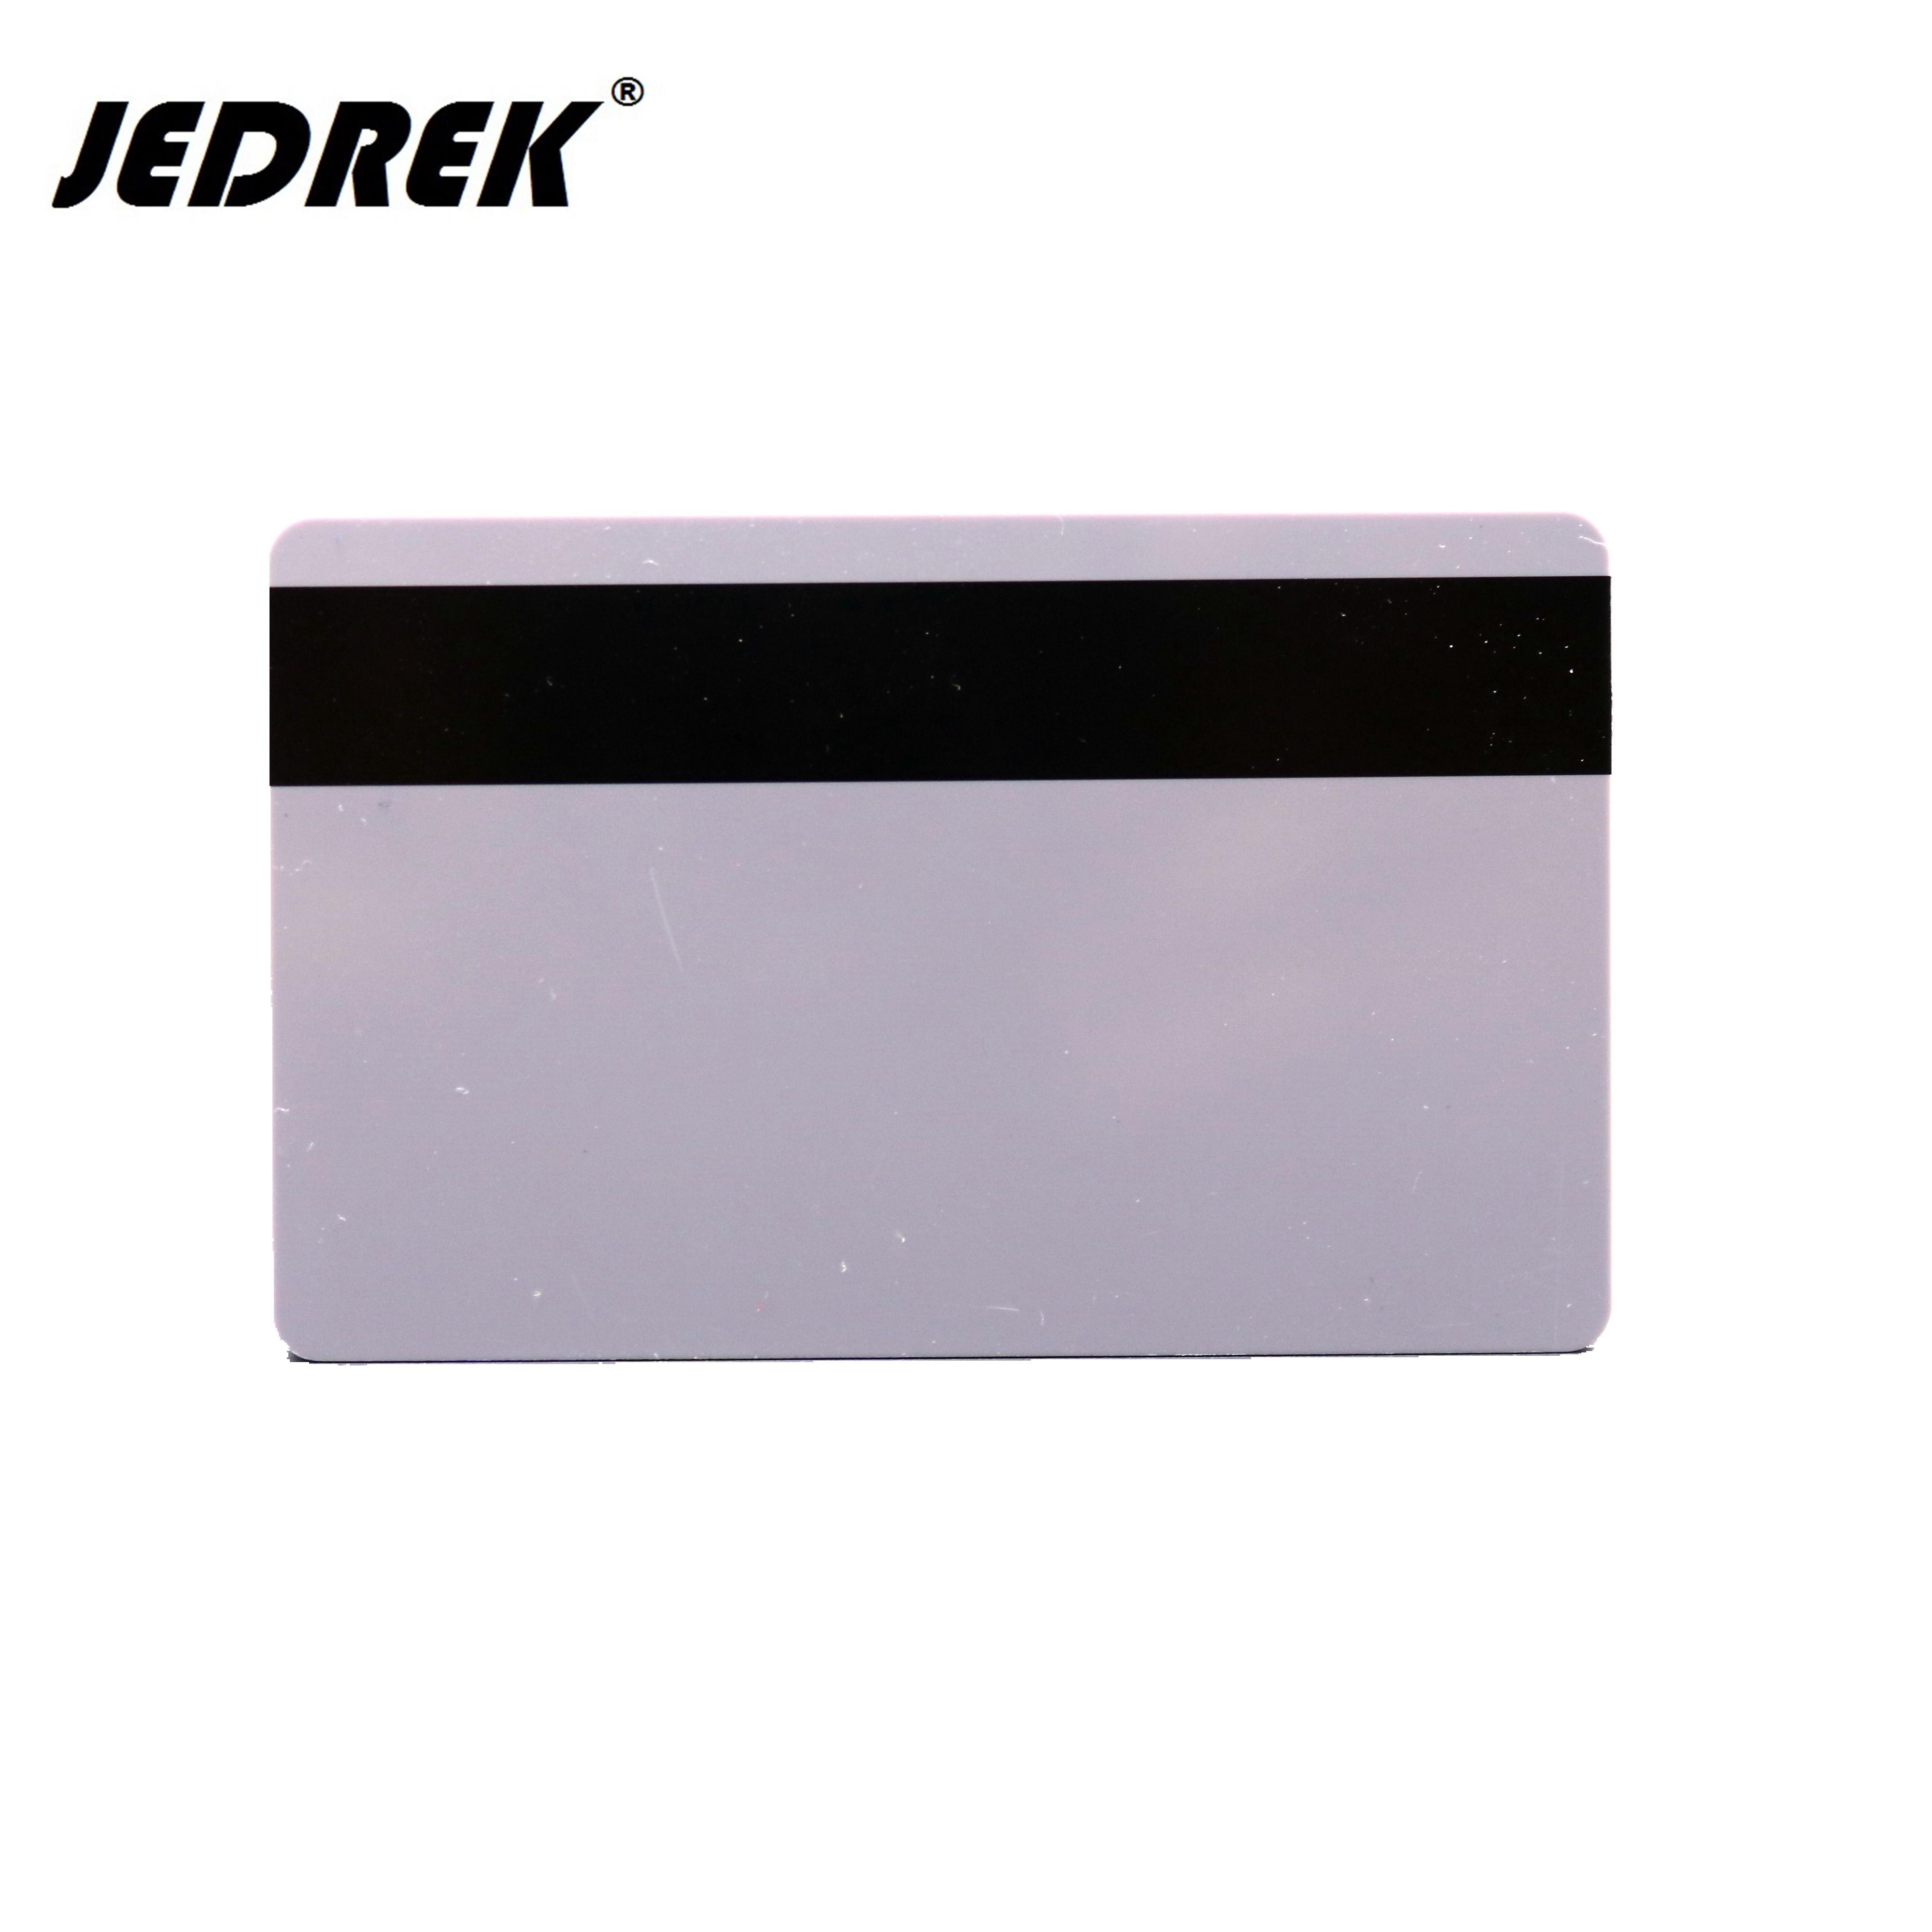 Blank PVC Magnetic Stripe Card 2750 OE Hi-Co 3 Track Magnetic Card Support High Resistance sme 8m zs 24v k 0 5 oe 543892 sme 8m ds 24v k 2 5 oe 543862 festo magnetic switch